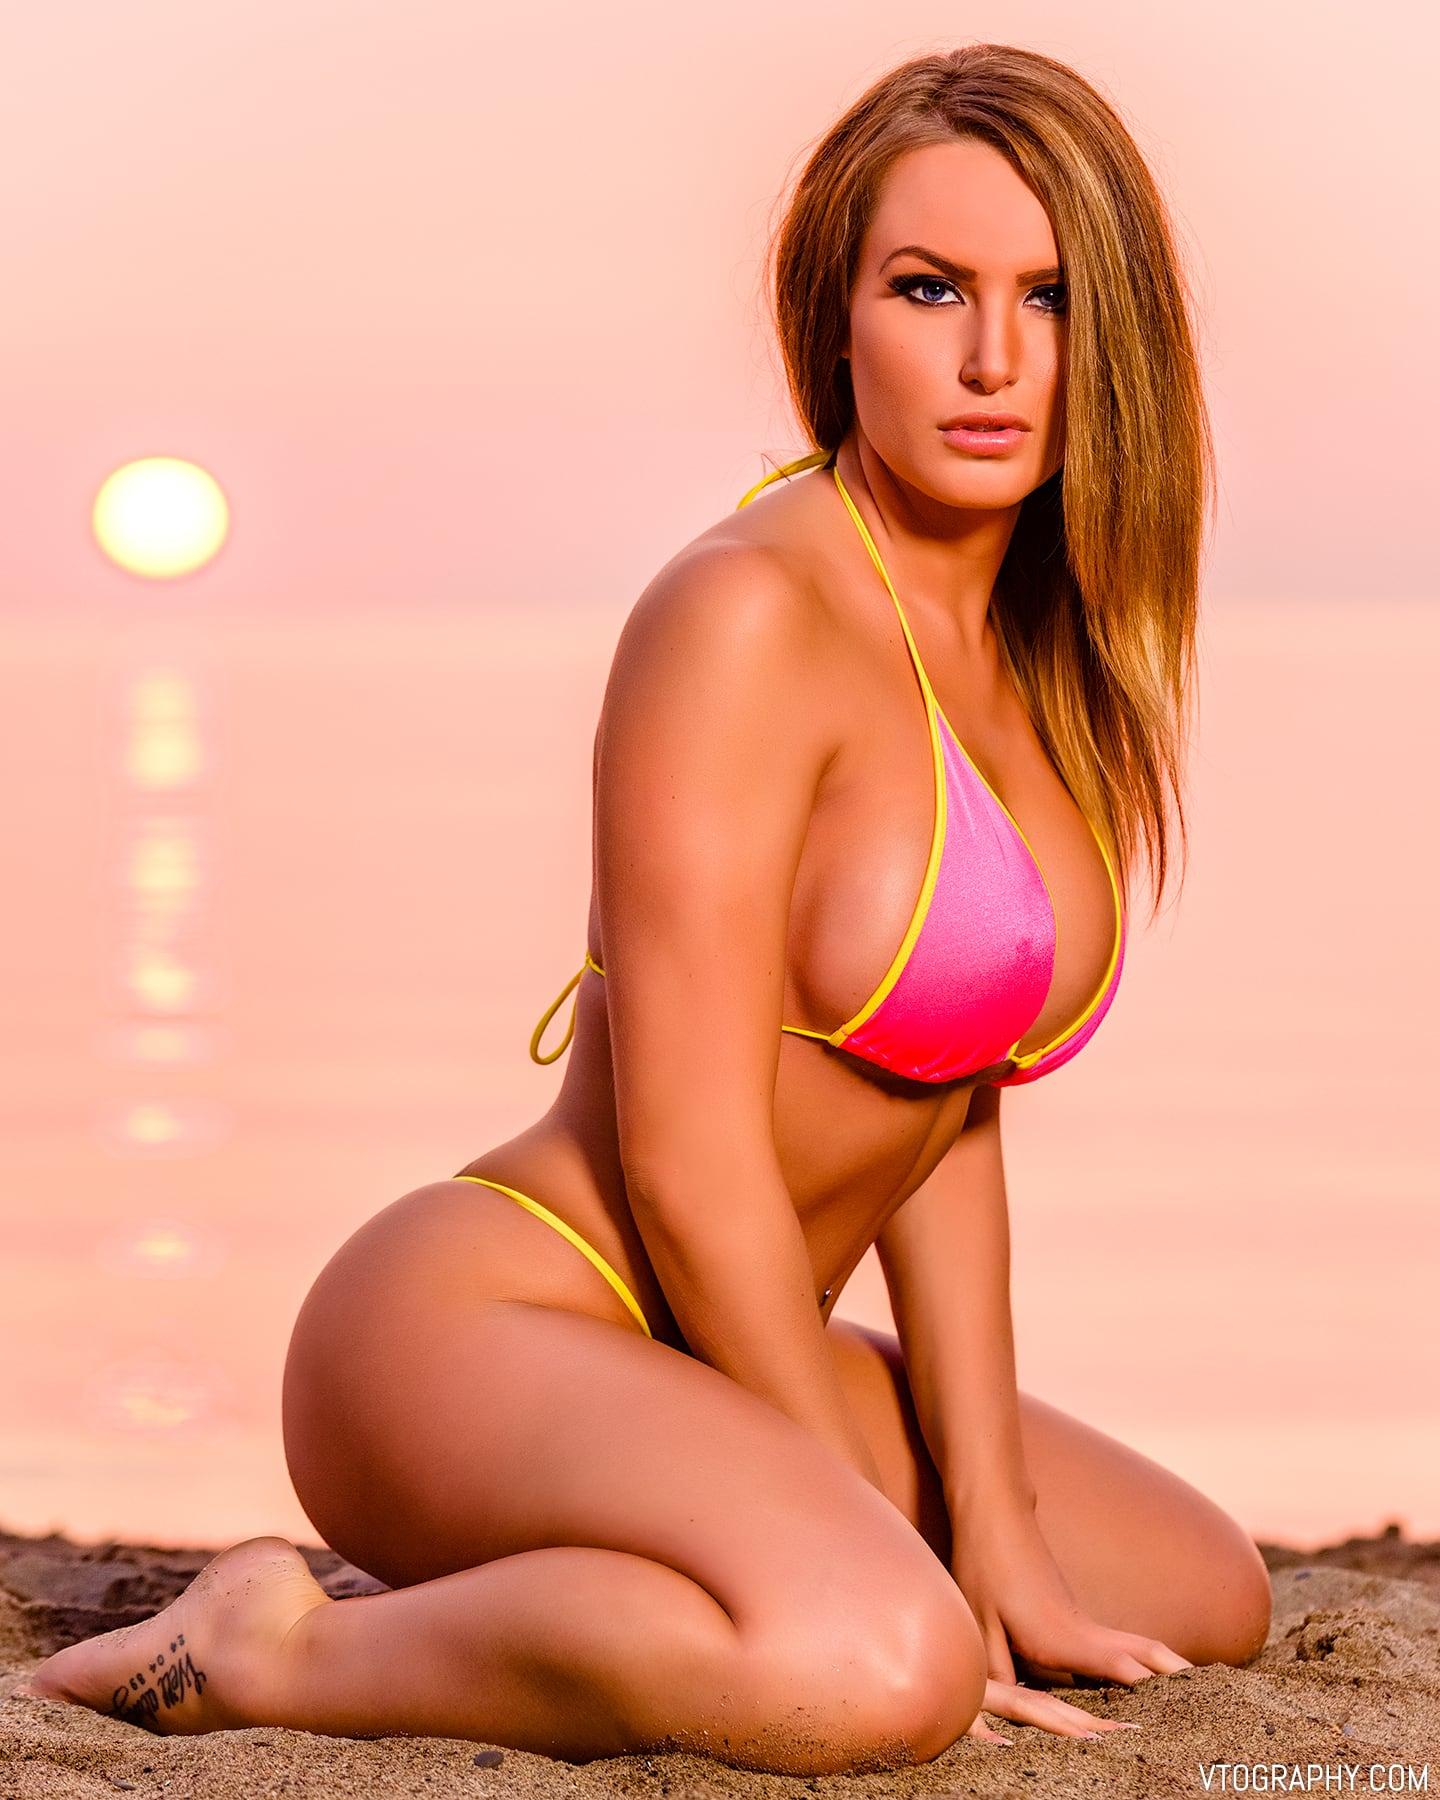 Bikini beach photo shoot with Samantha, photographed with Paul C. Buff Einstein monolight